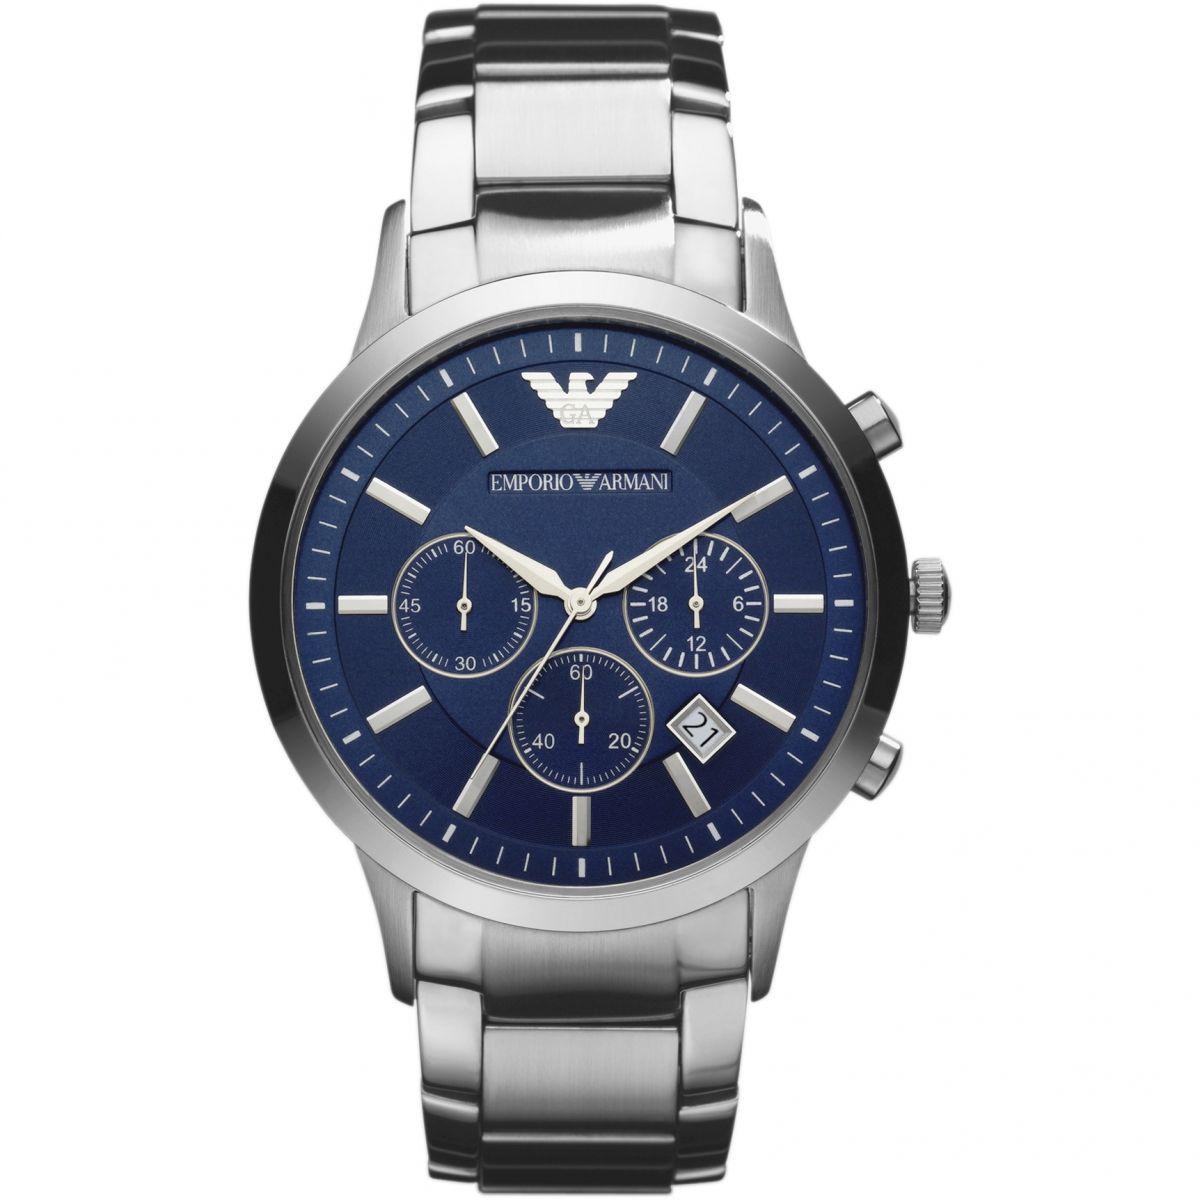 Gents Emporio Armani Chronograph Watch (AR2448) | WatchShop.com™